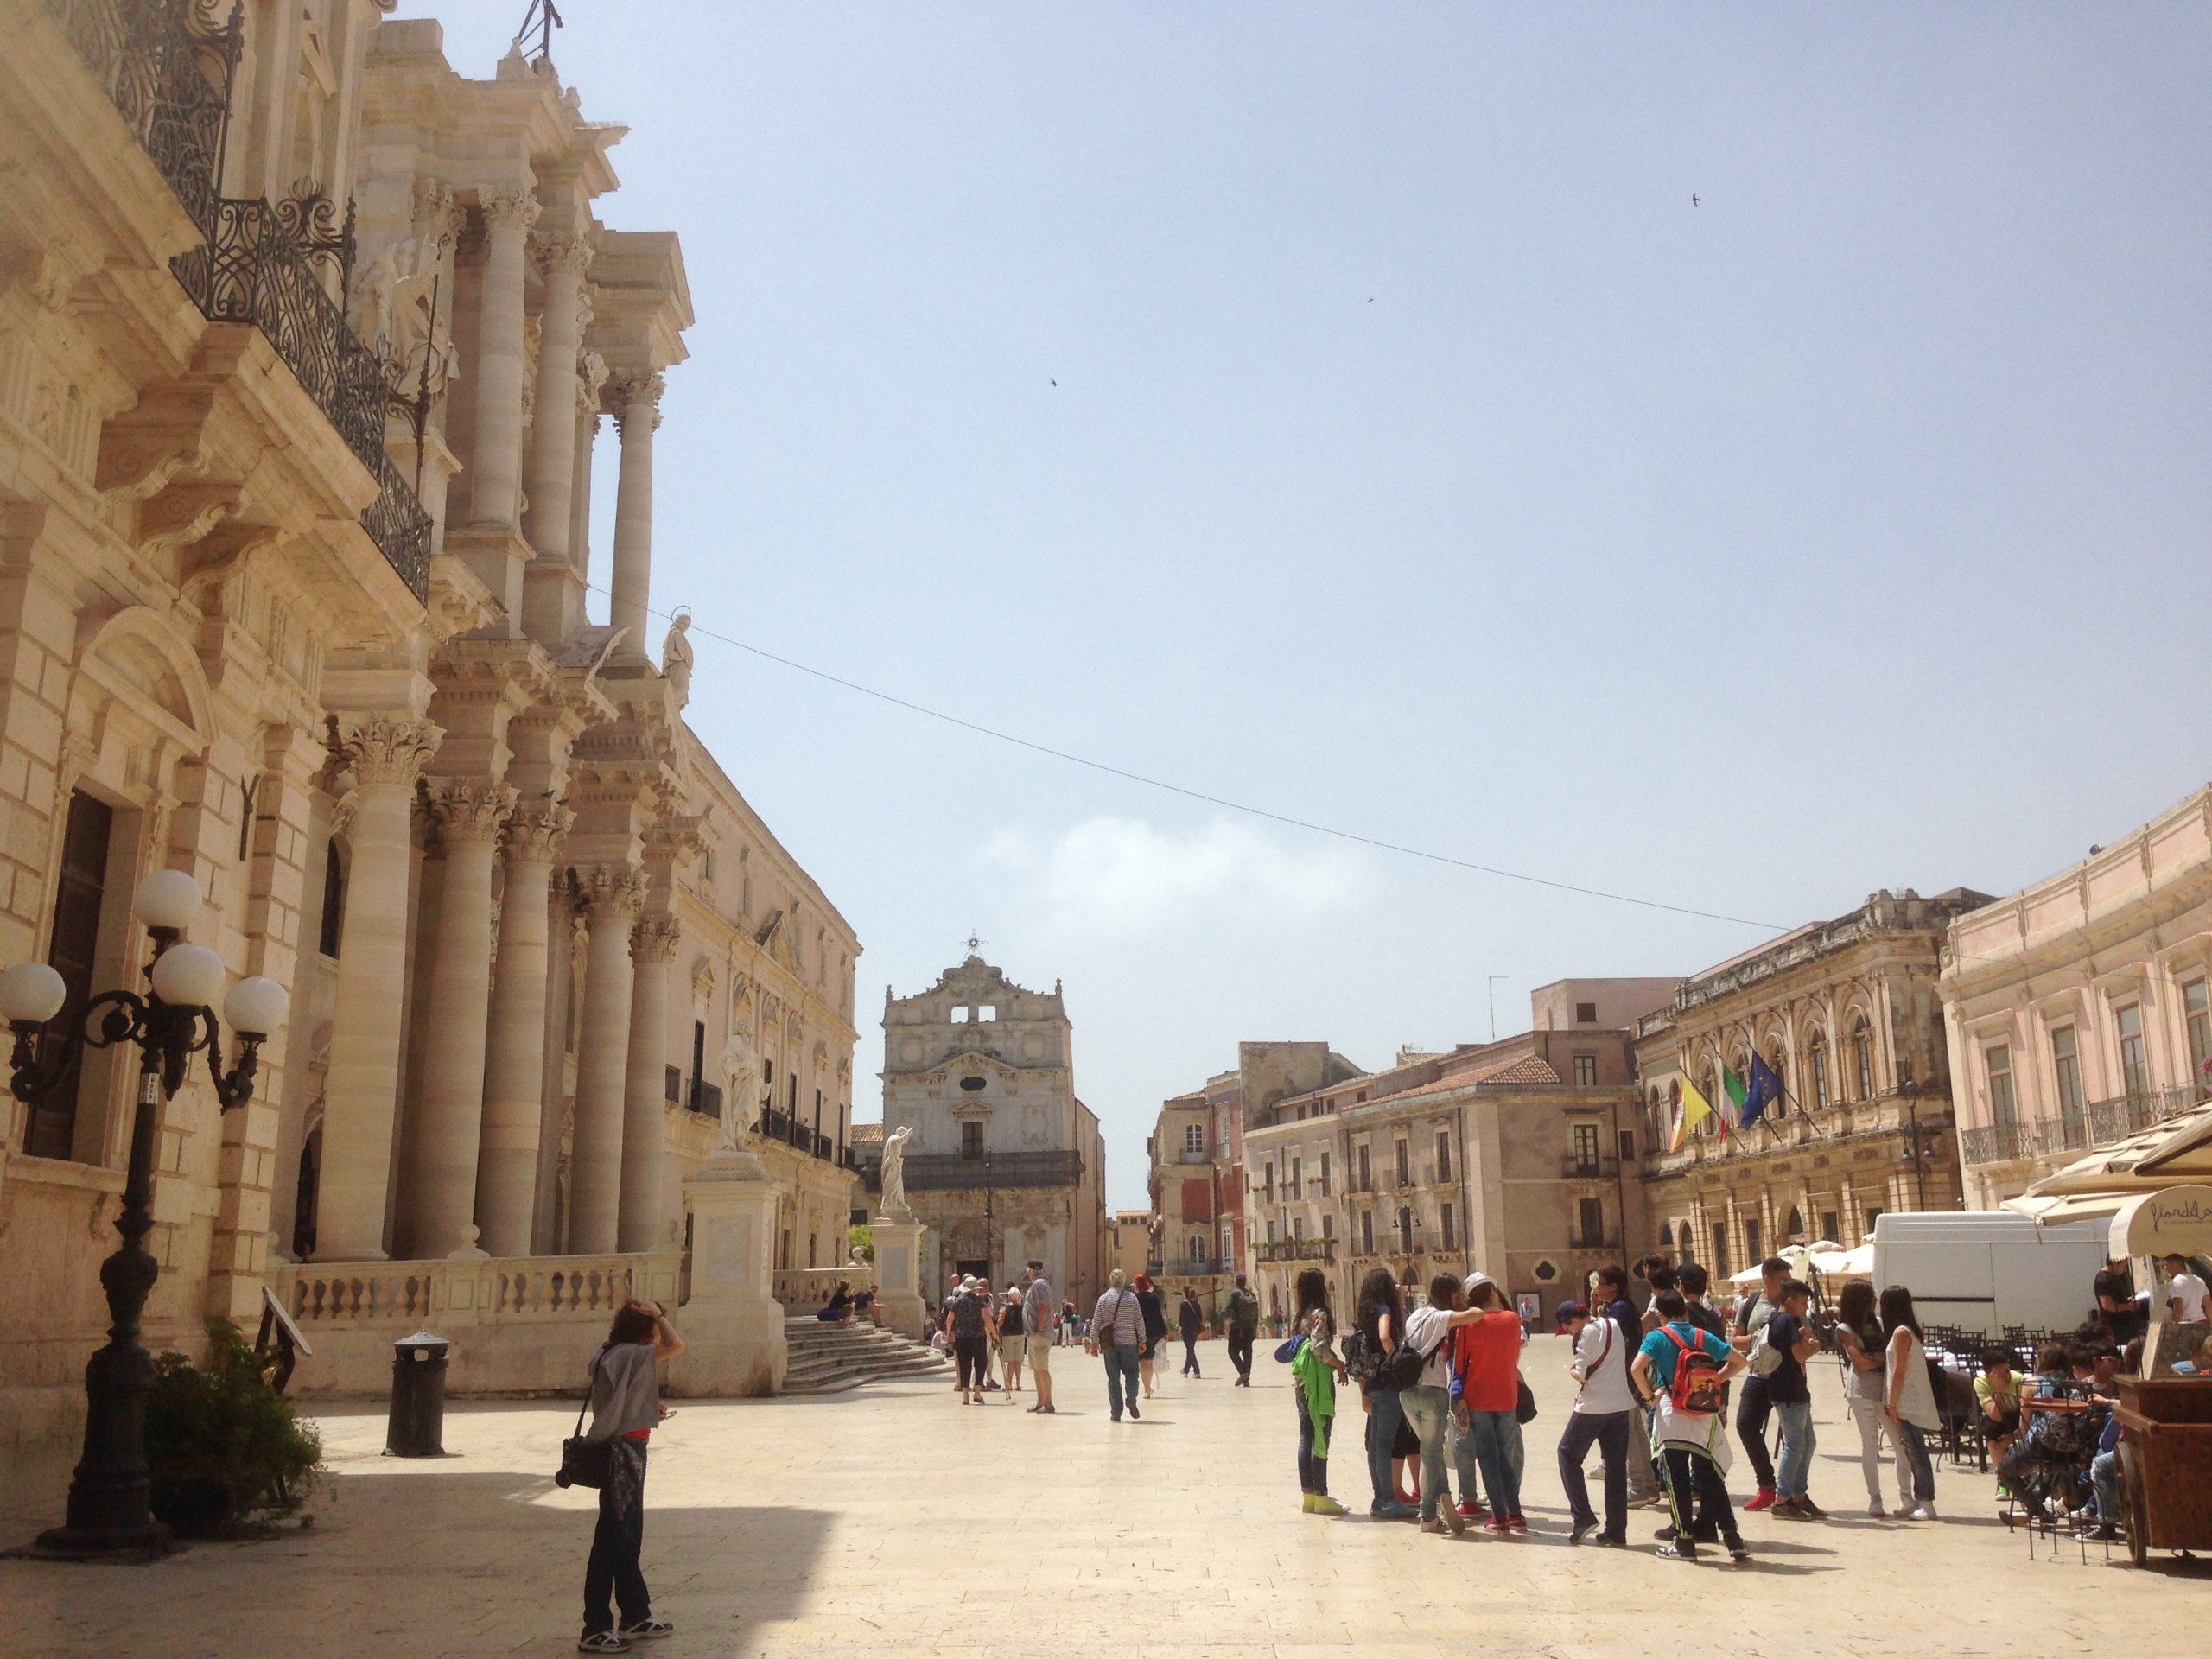 Cathedral Square in Ortigia Syracuse, Sicily